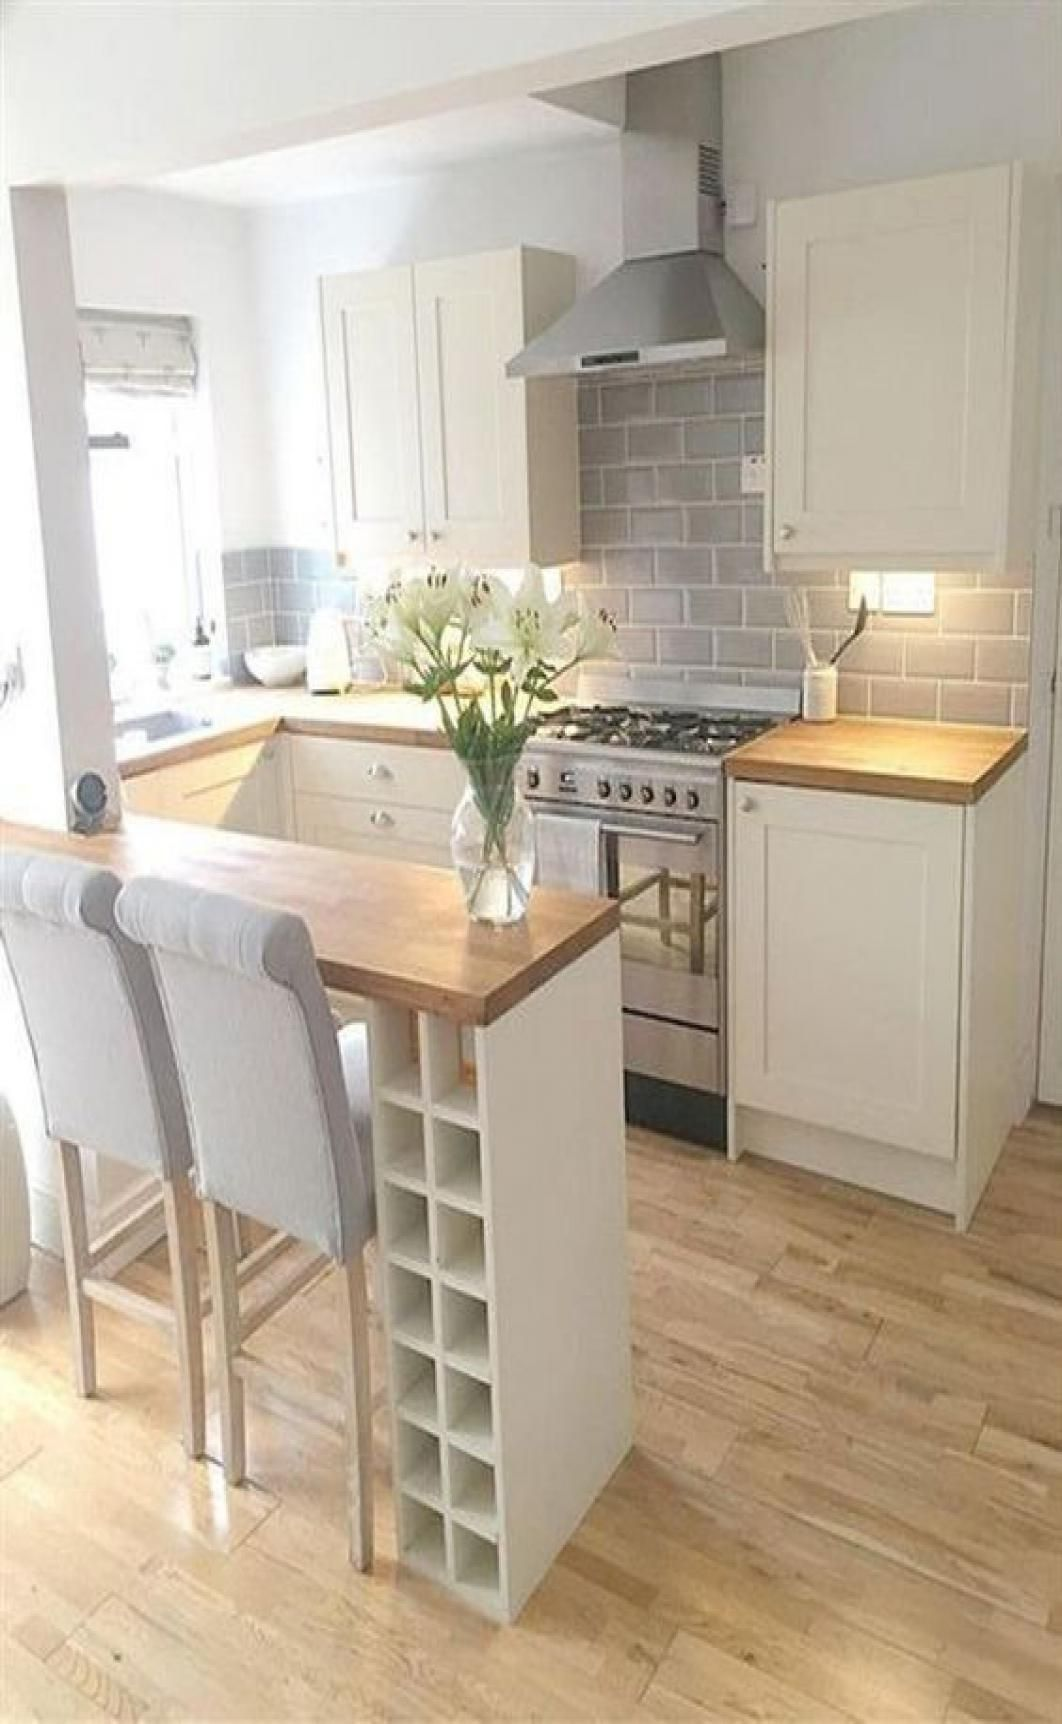 Small Kitchen Design 10x10: 46 Wonderful Modern And Sophisticated Kitchen Design Ideas